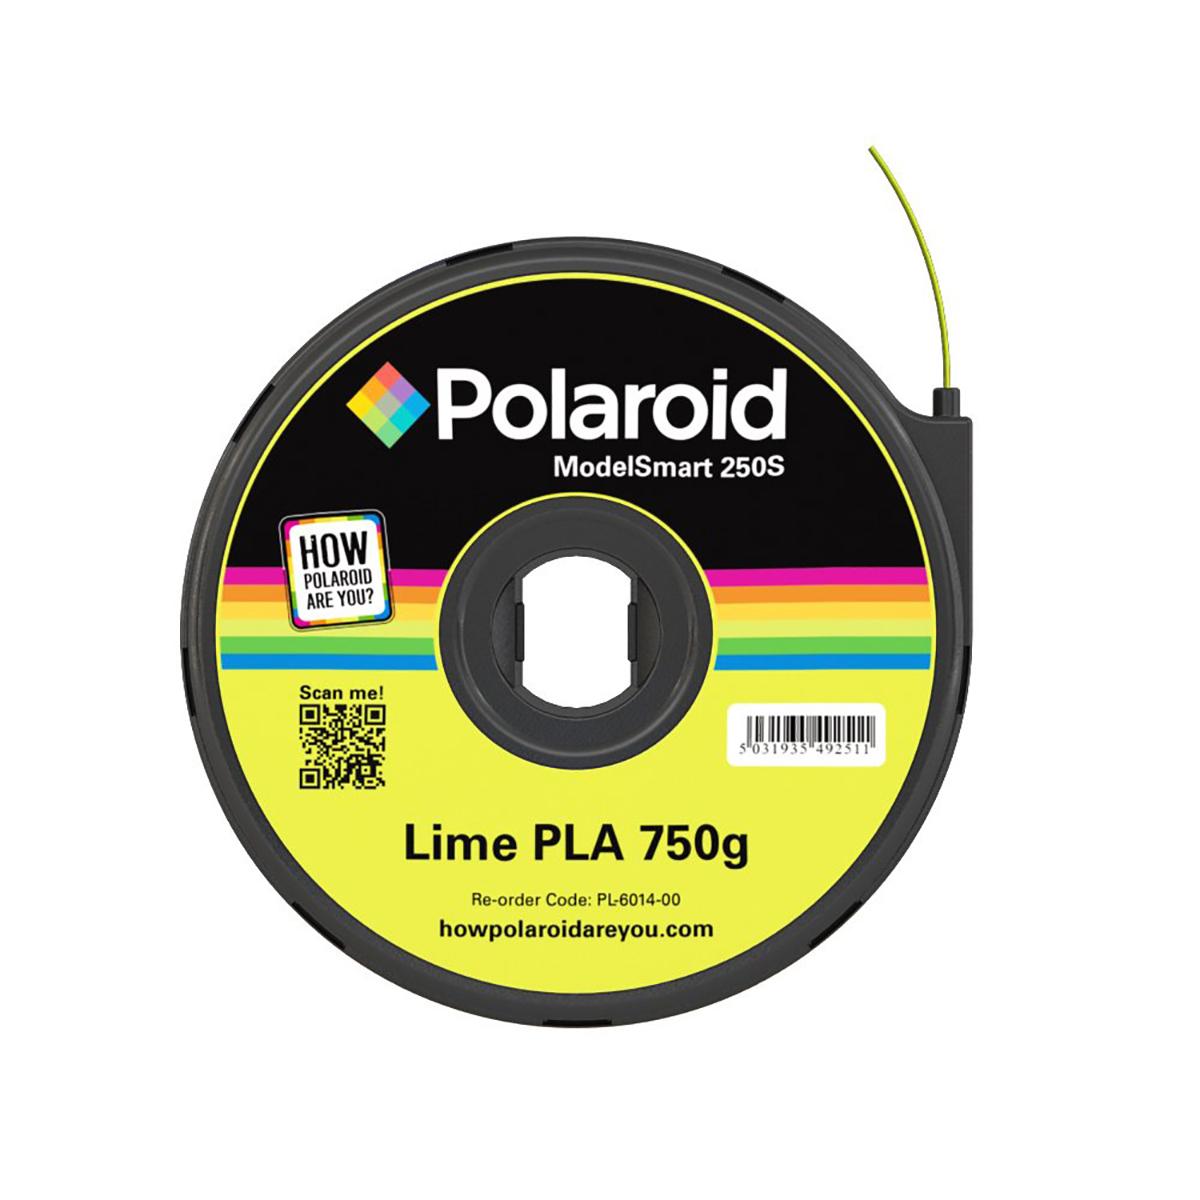 Polaroid ModelSmart 250S Lime Filament Cartridge - 750g